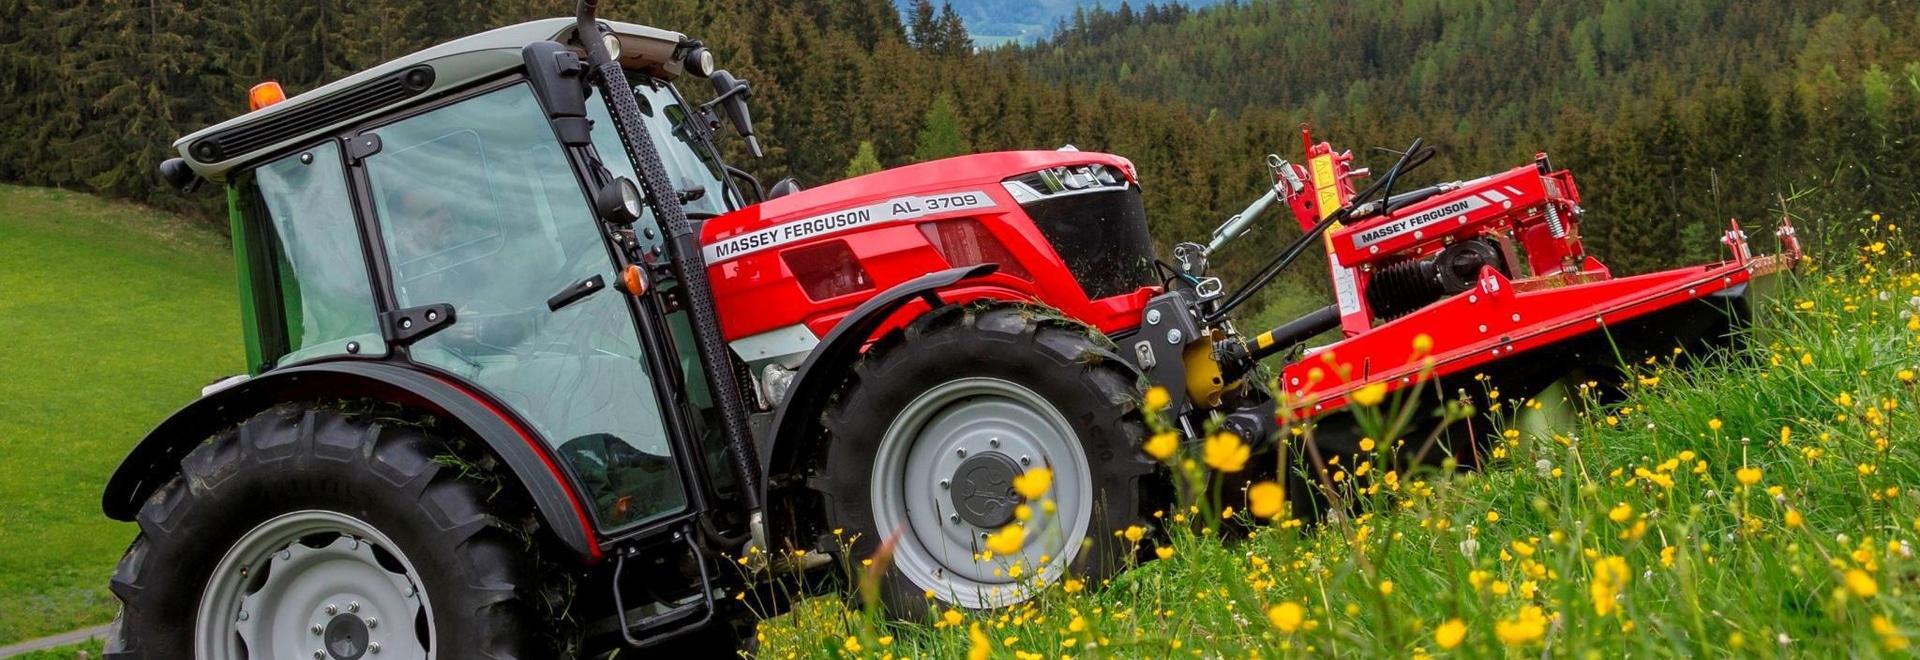 Massey Ferguson launches compact 3700 AL tractor range